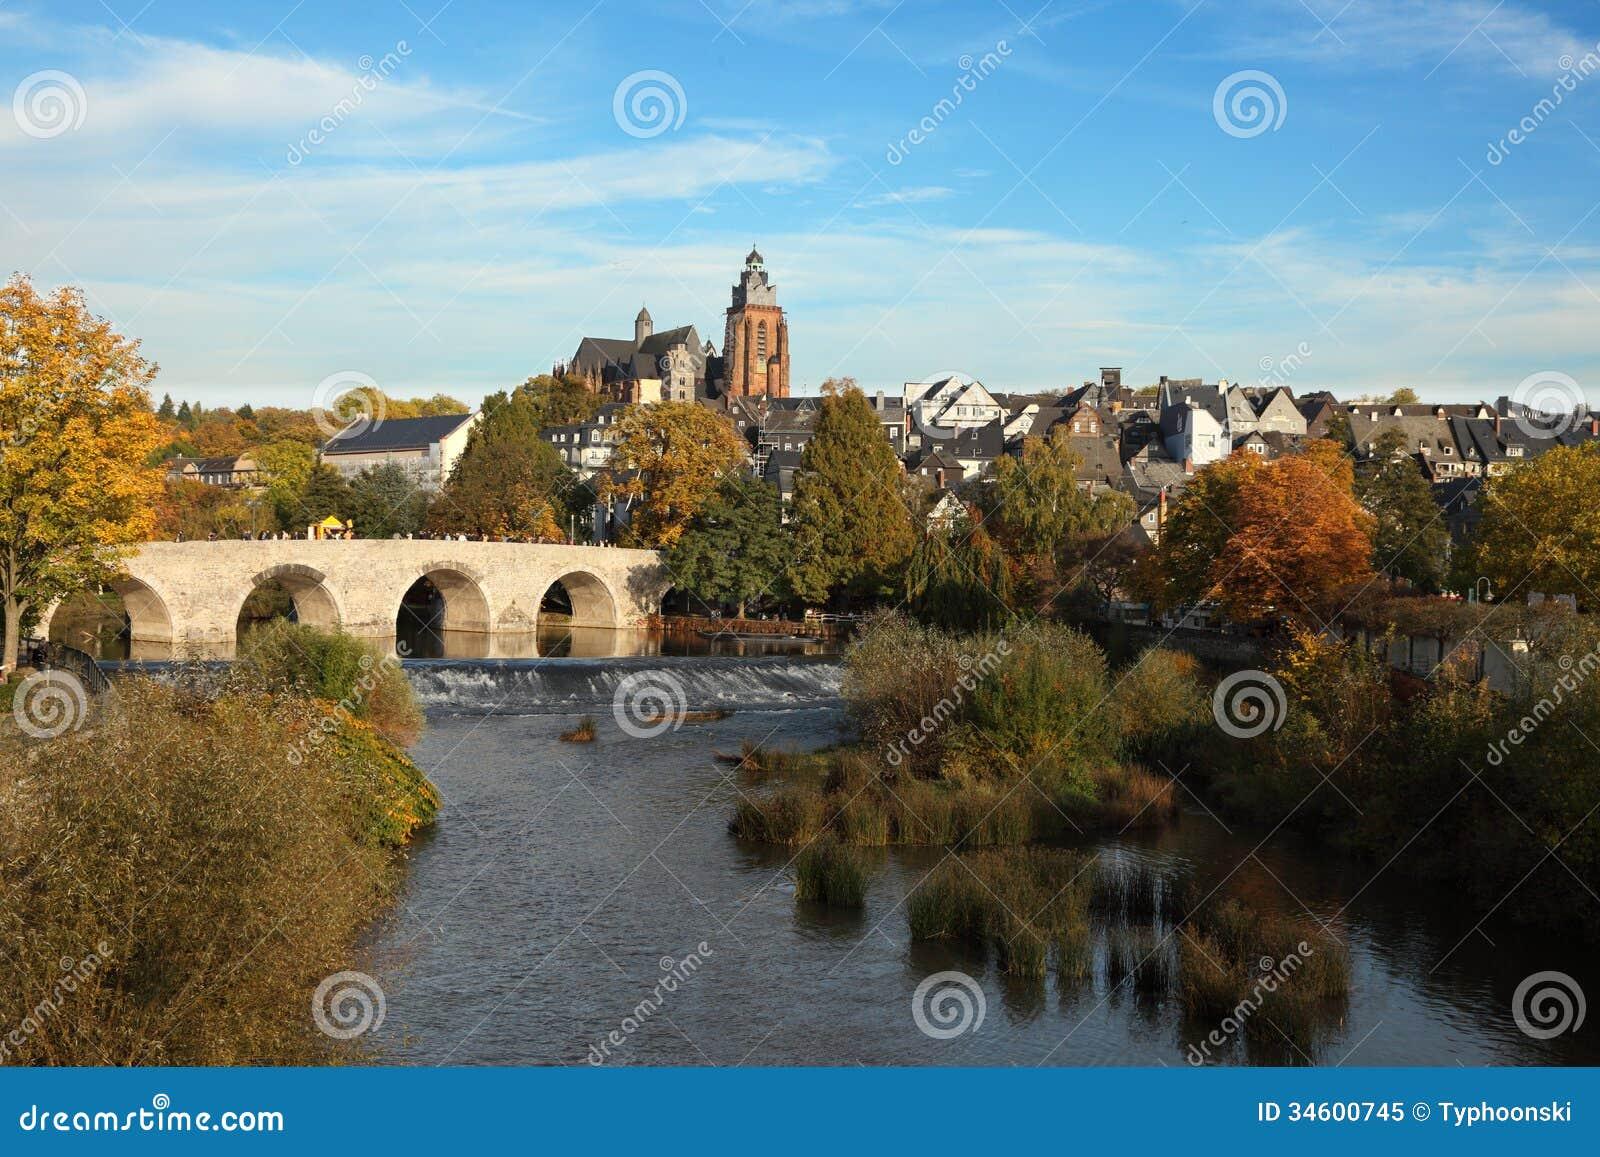 lahn river in wetzlar germany royalty free stock photo image 34600745. Black Bedroom Furniture Sets. Home Design Ideas